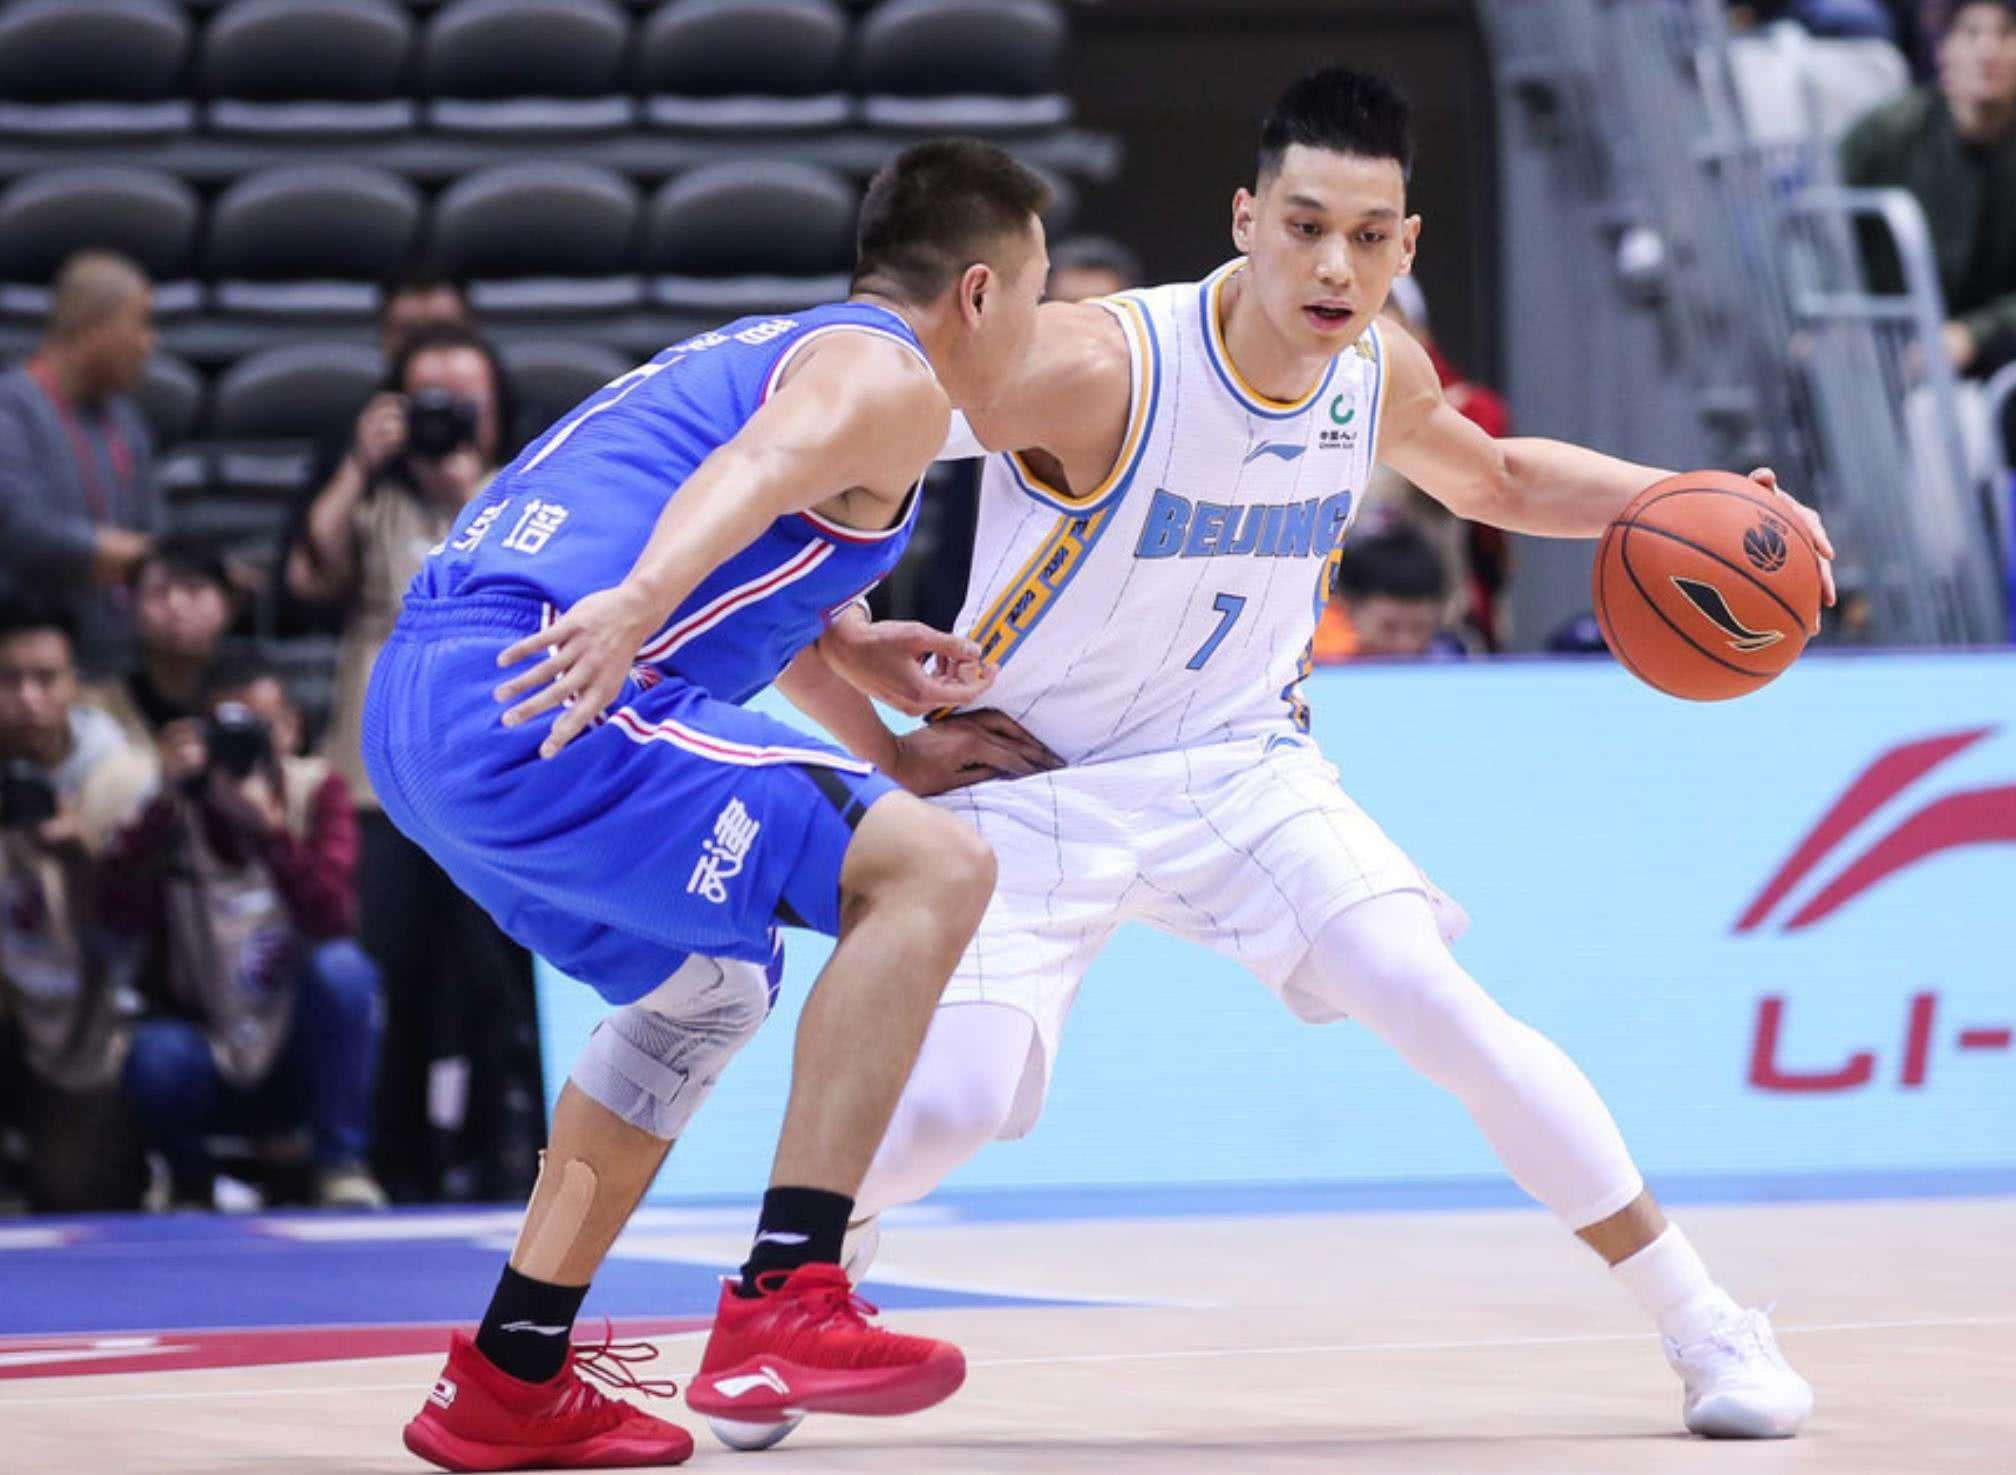 CBA常规赛北京vs辽宁免费直播预告 双外援与全华班的较量